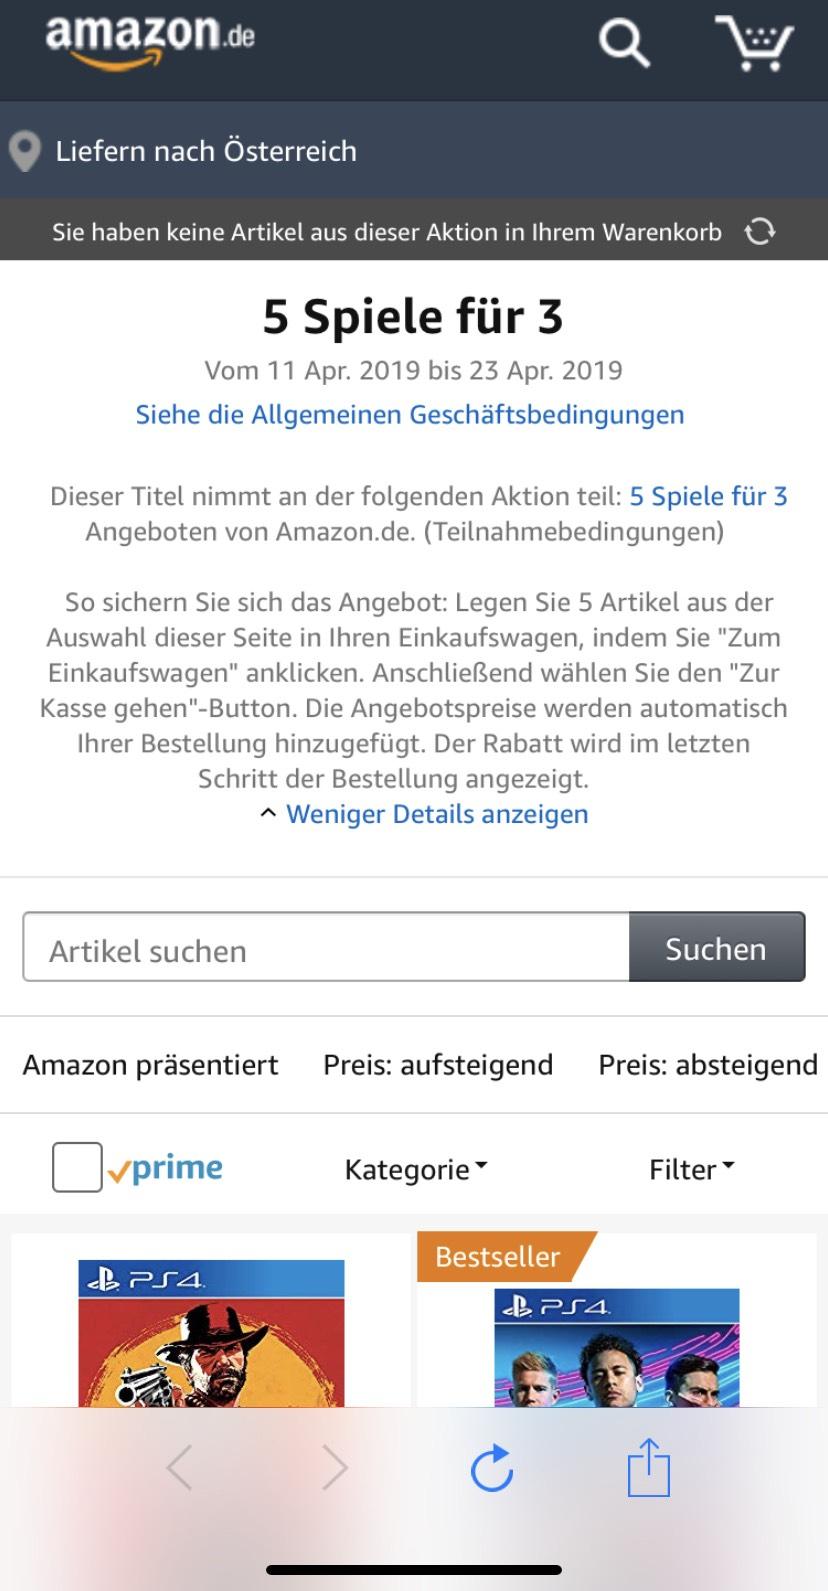 Kaufe 5 Spiele und zahle 3 [Amazon.de)